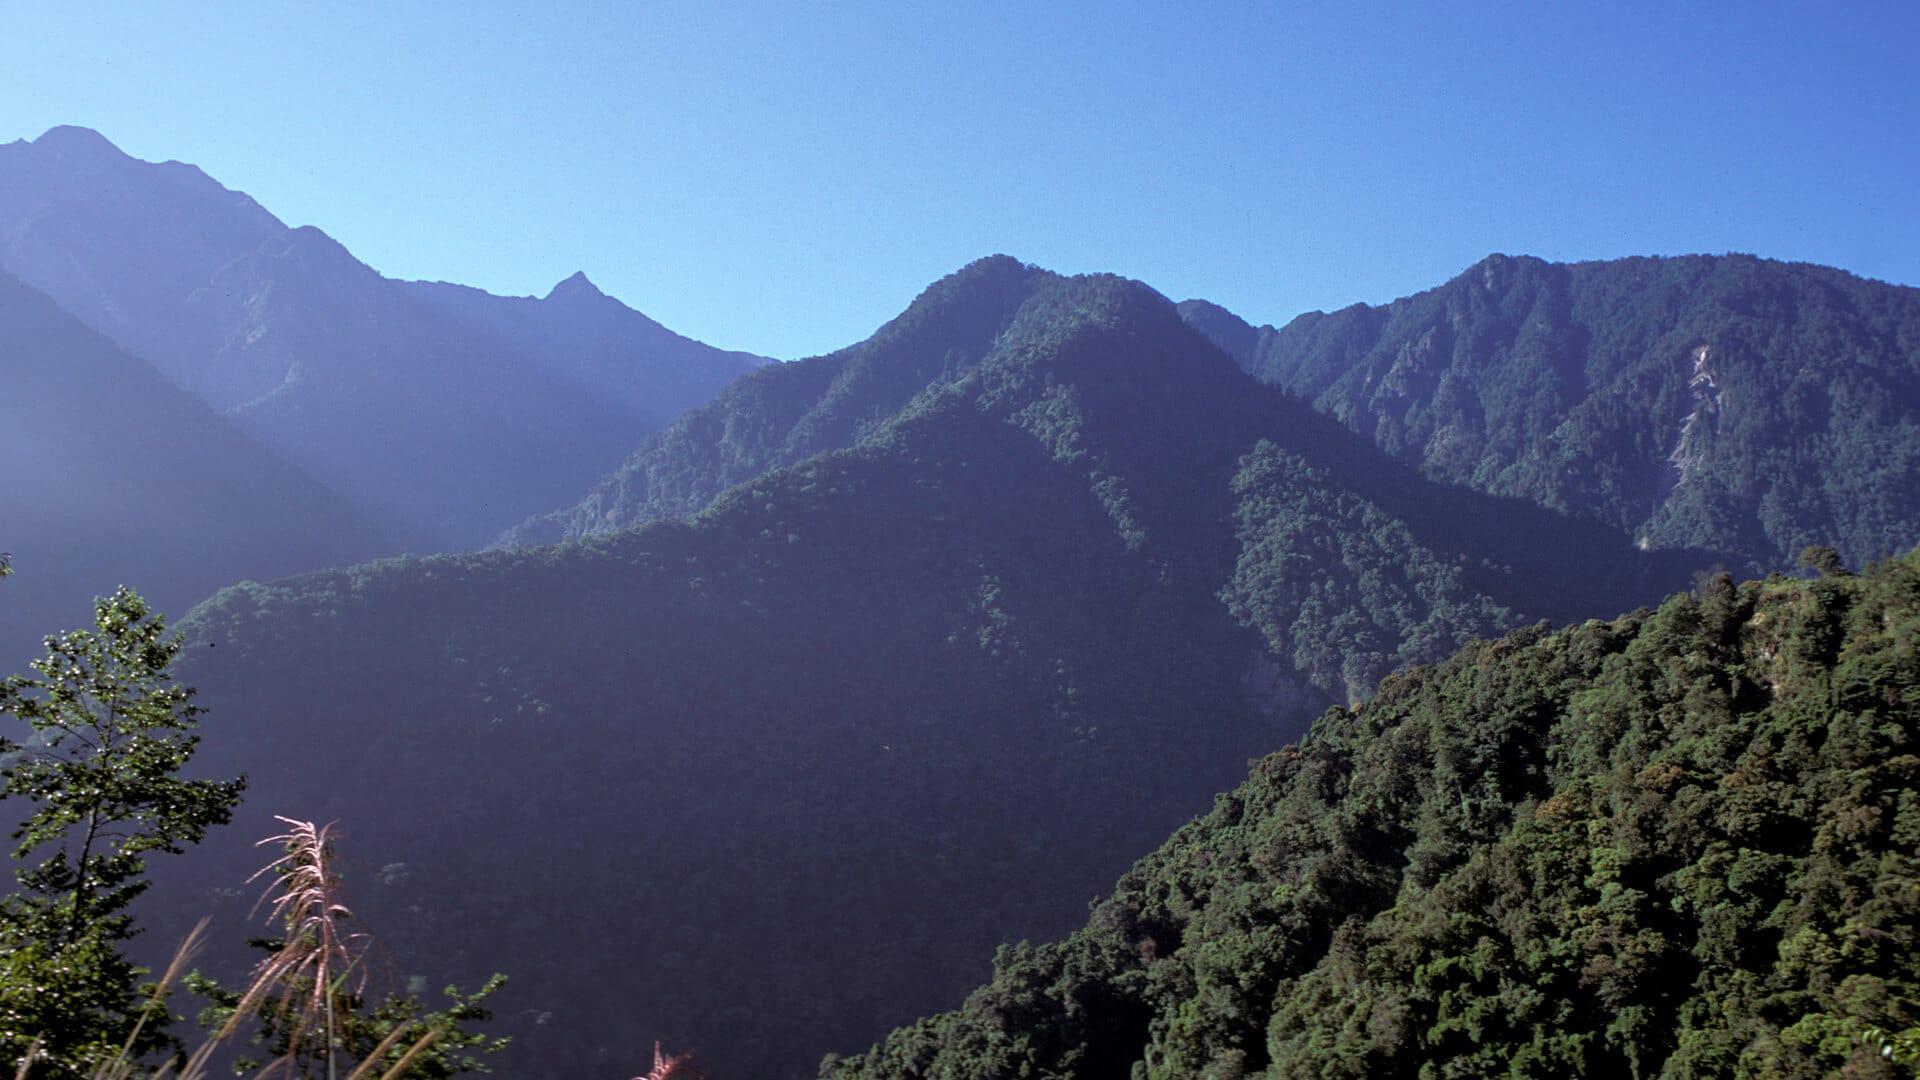 Taiwan Typhoon Island Sciencevision